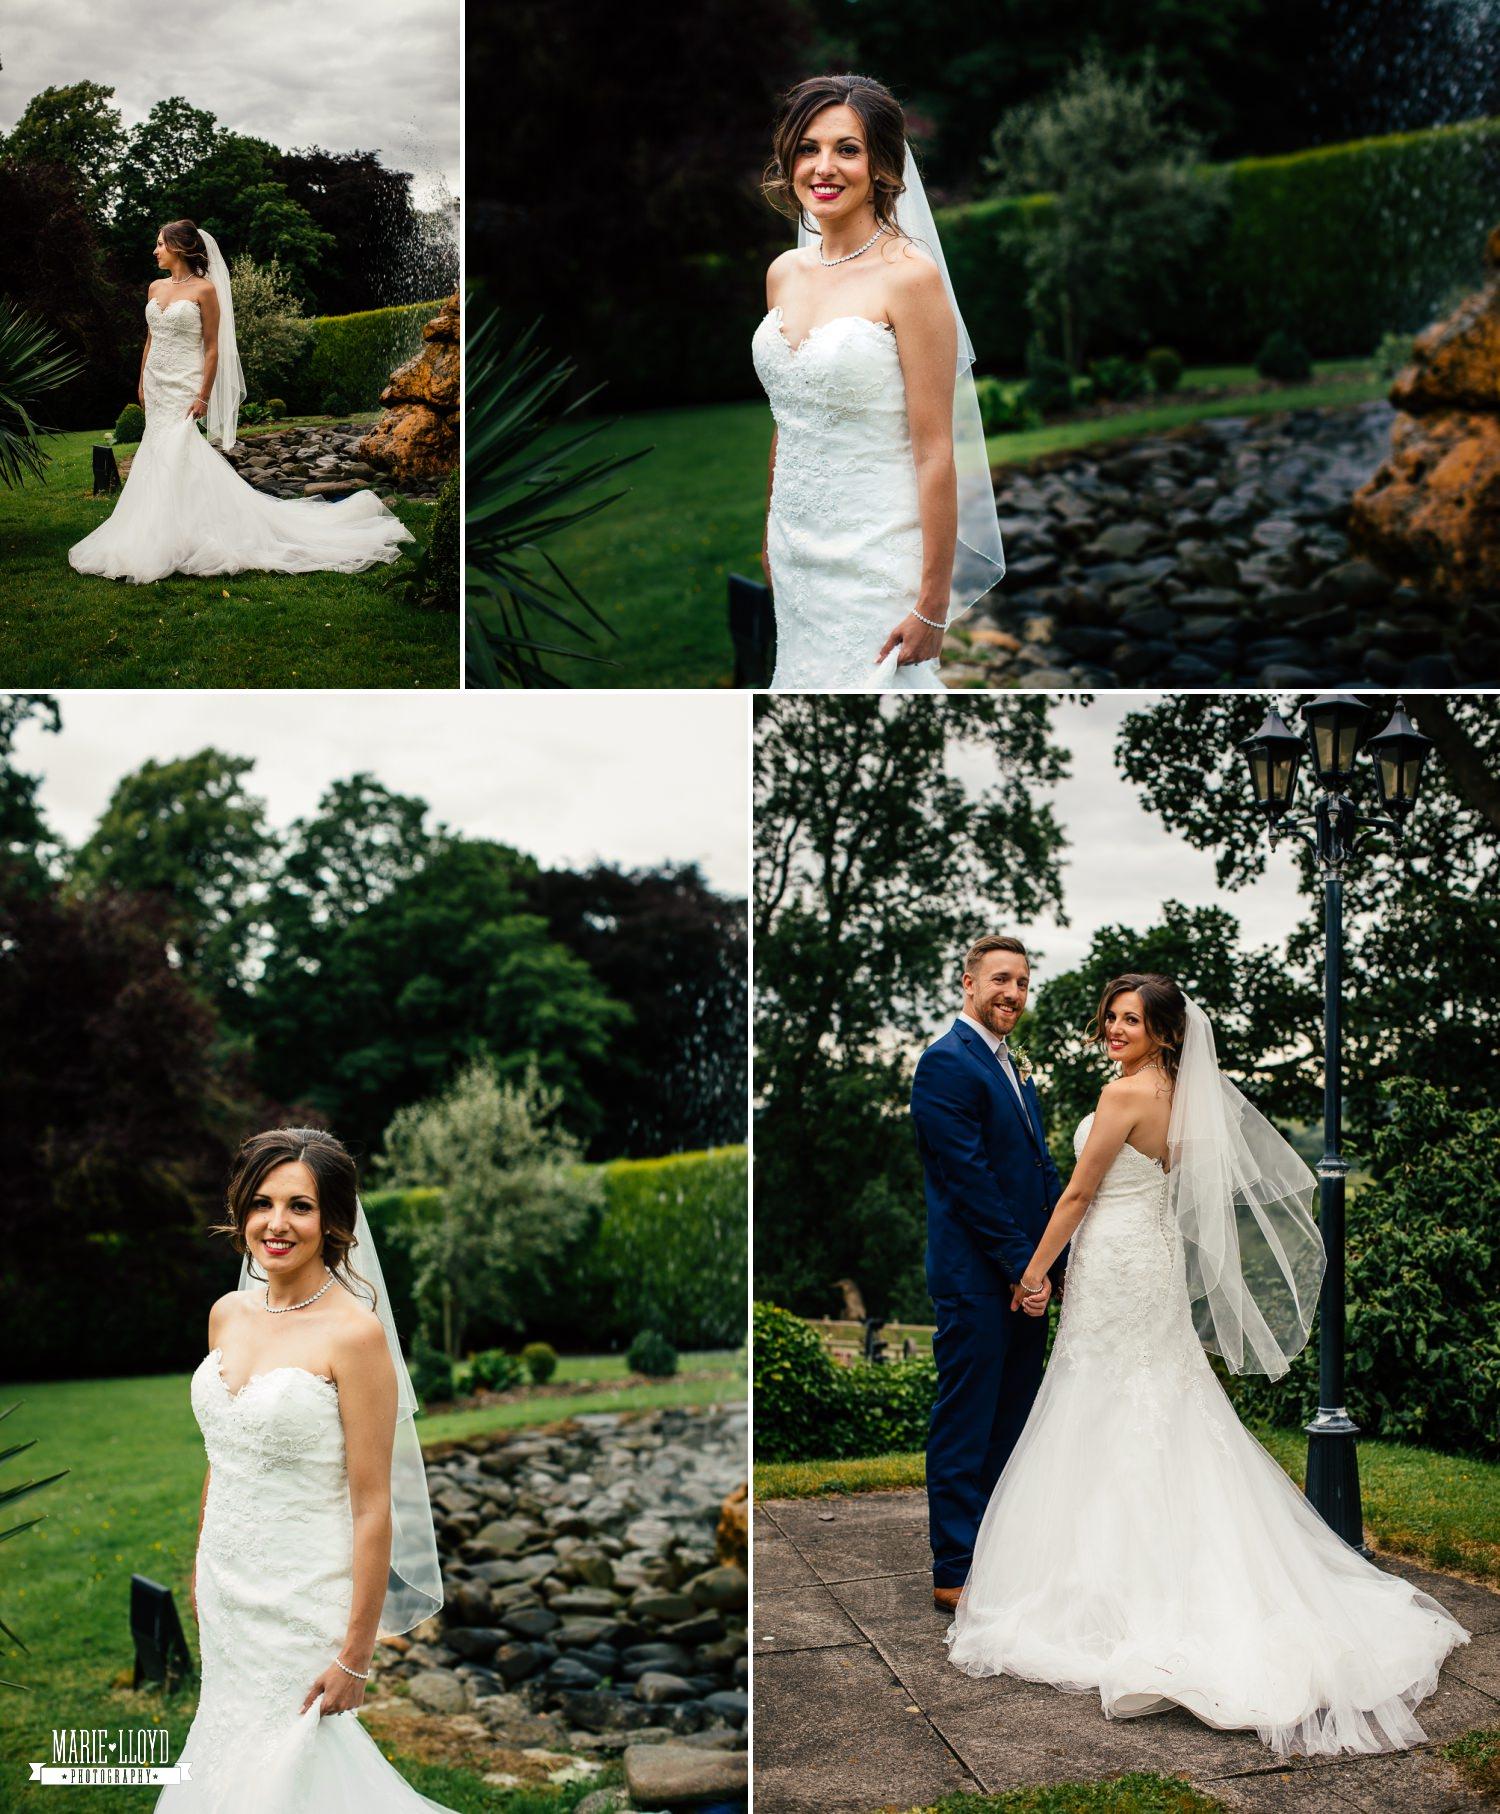 Wedding Photography bridal portraits at Plas Isaf, North Wales